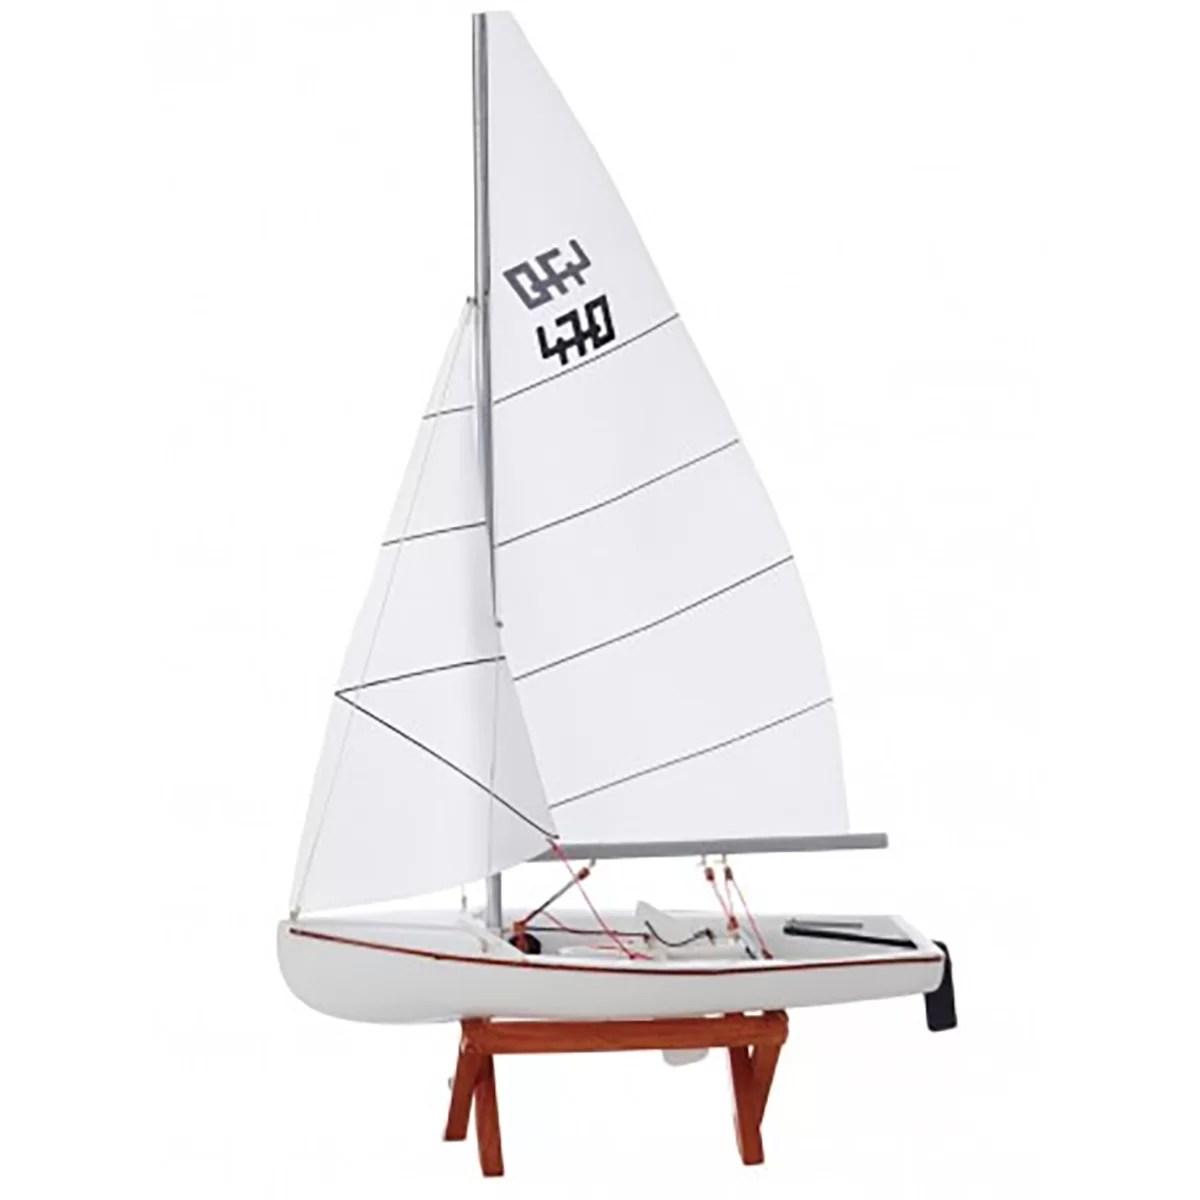 Vitorlás 470 makett L26 Balatoni hajómakett